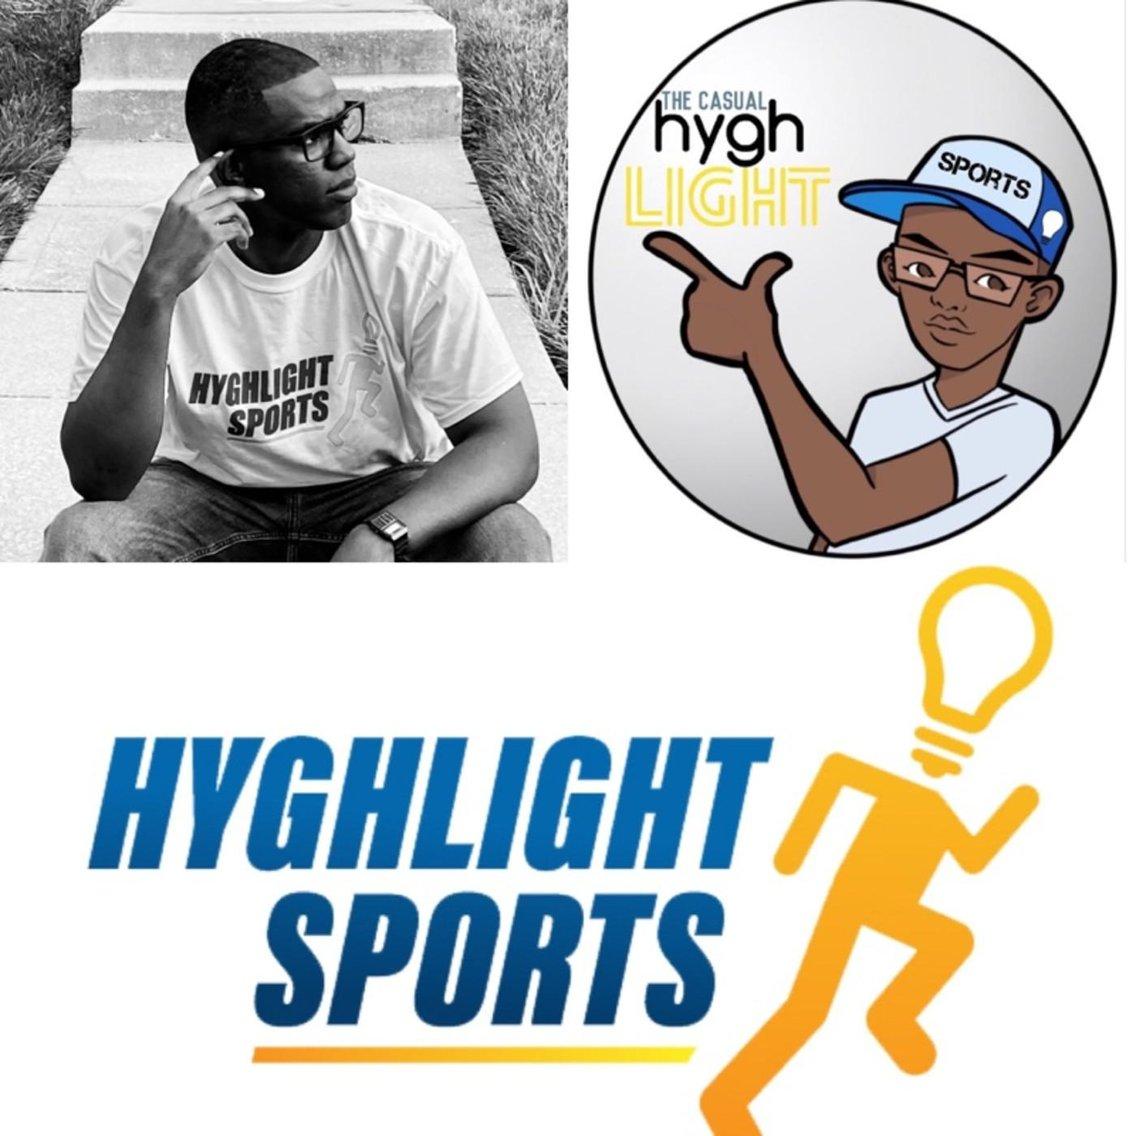 The Casual Hyghlight - immagine di copertina